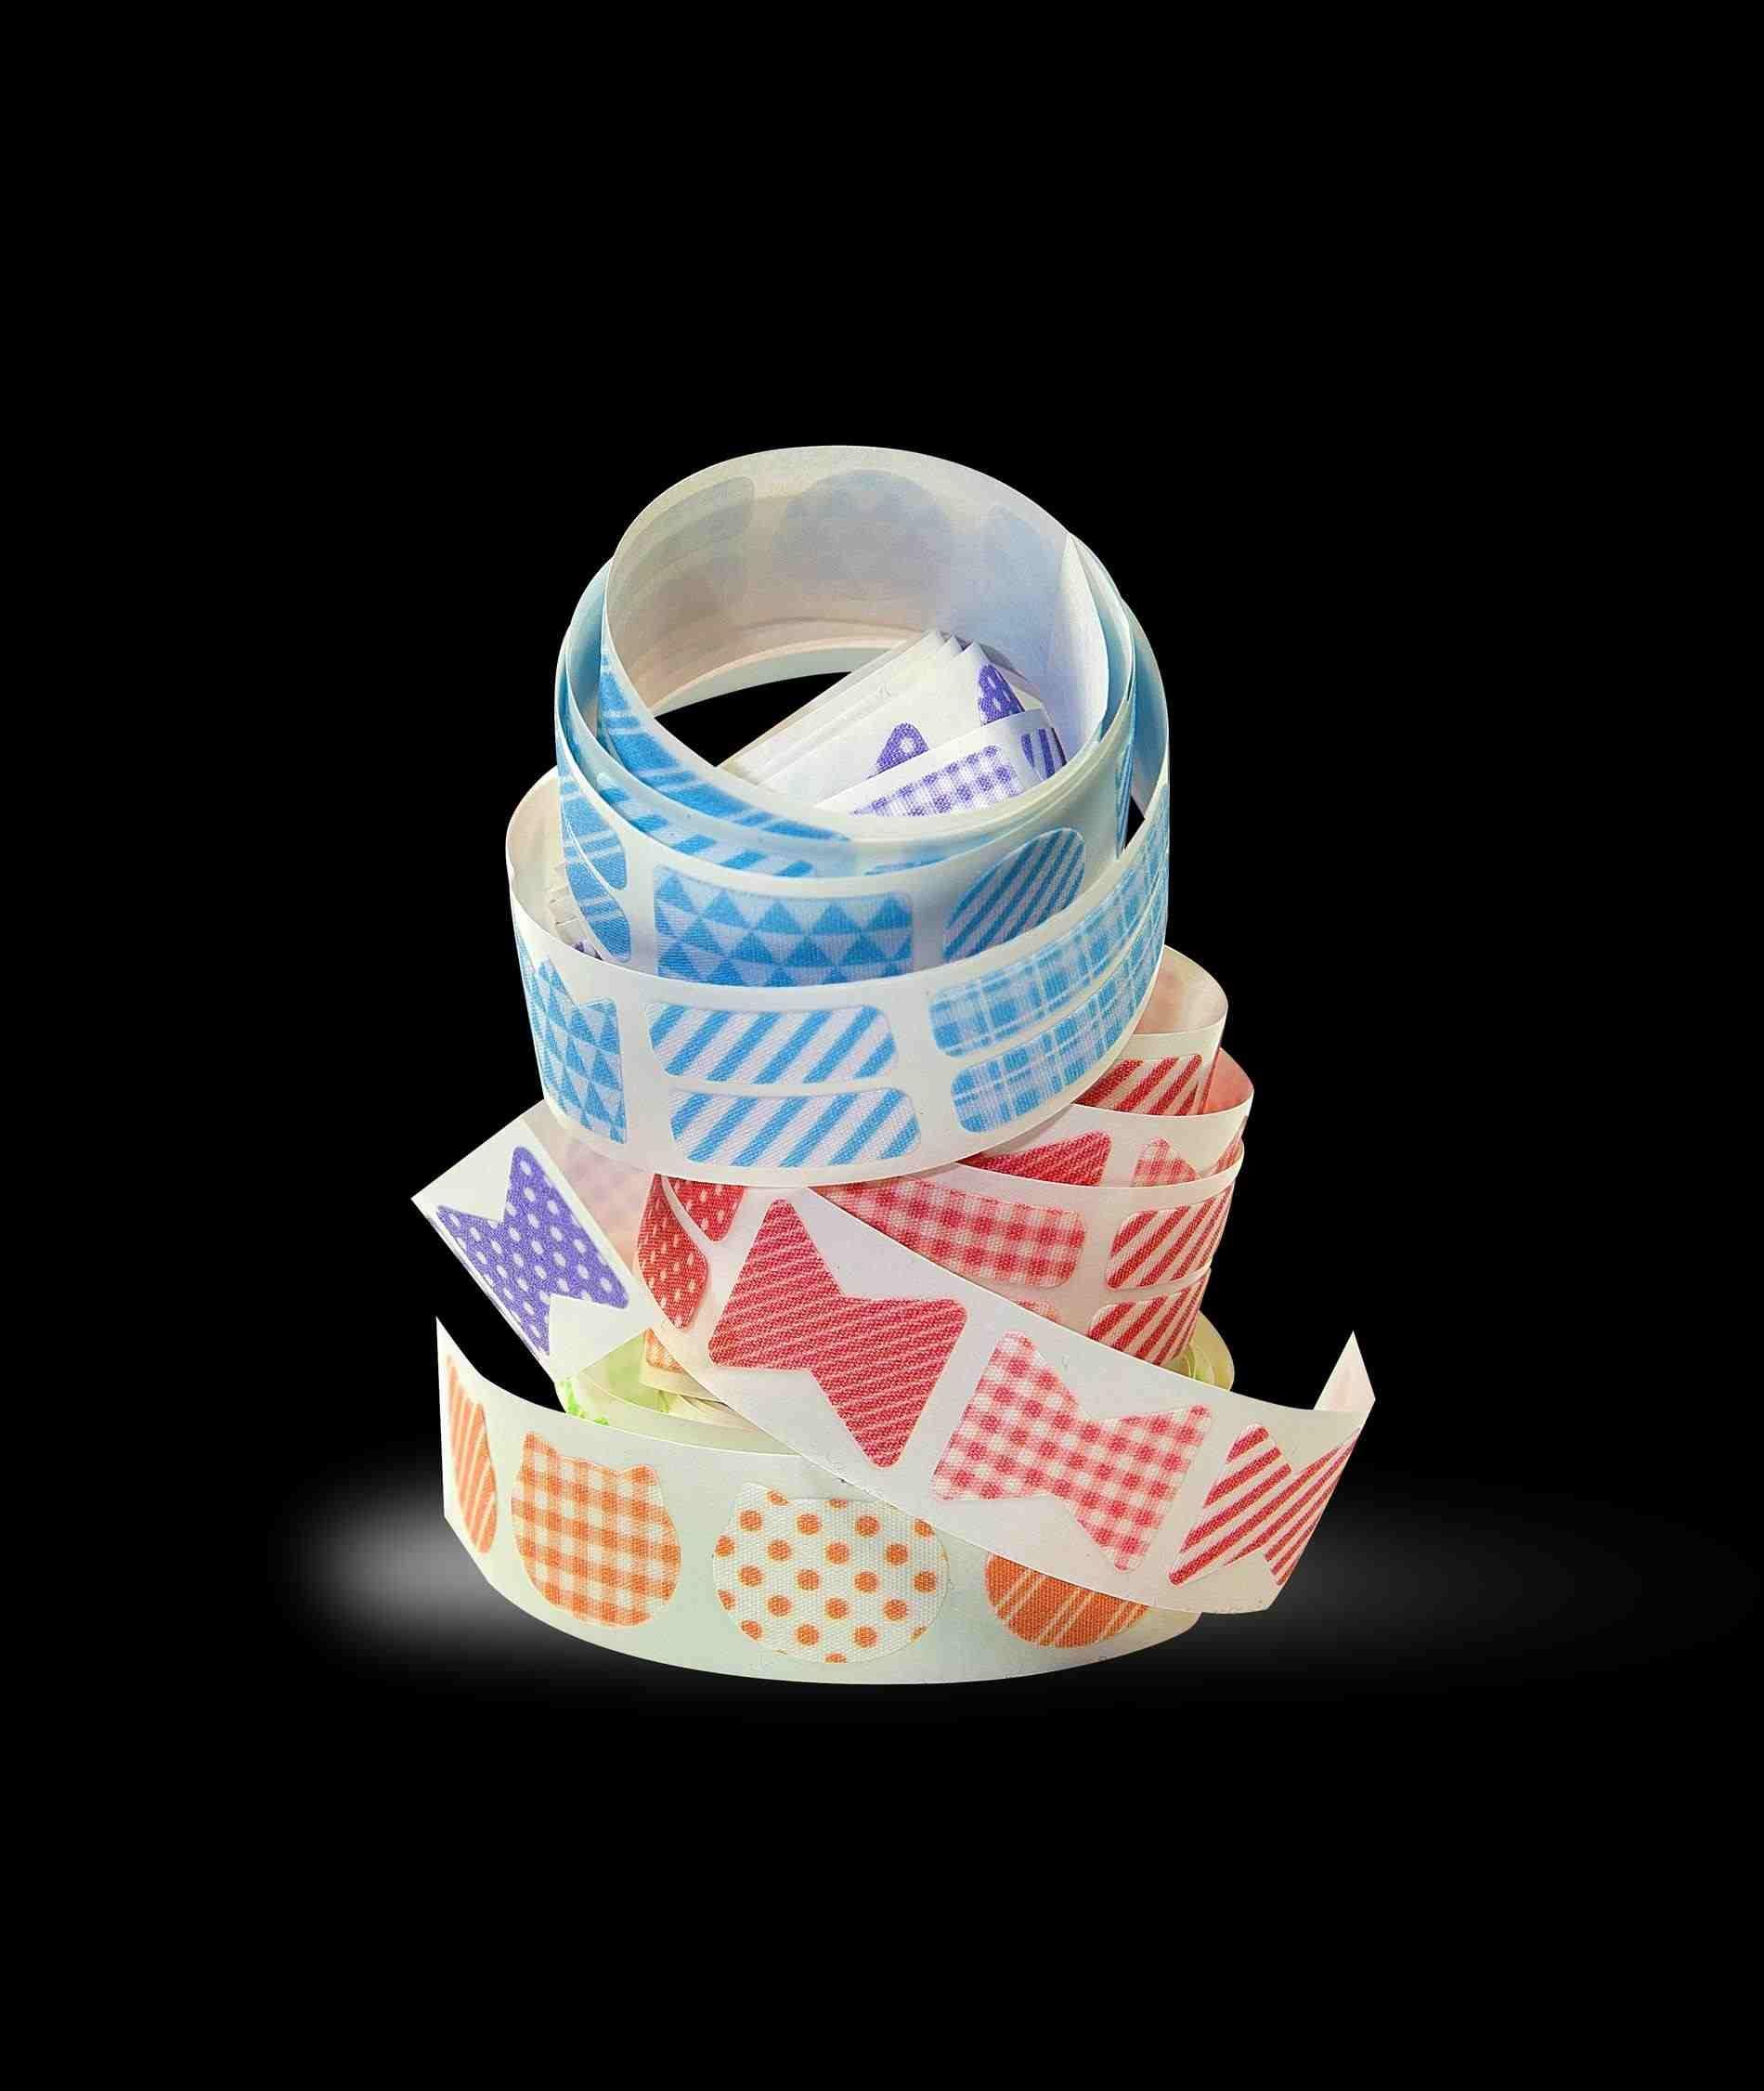 d1452954a4f942 Fabric Crafts For Kids - diy kids flip flop tutorial-reuse fabric scraps!